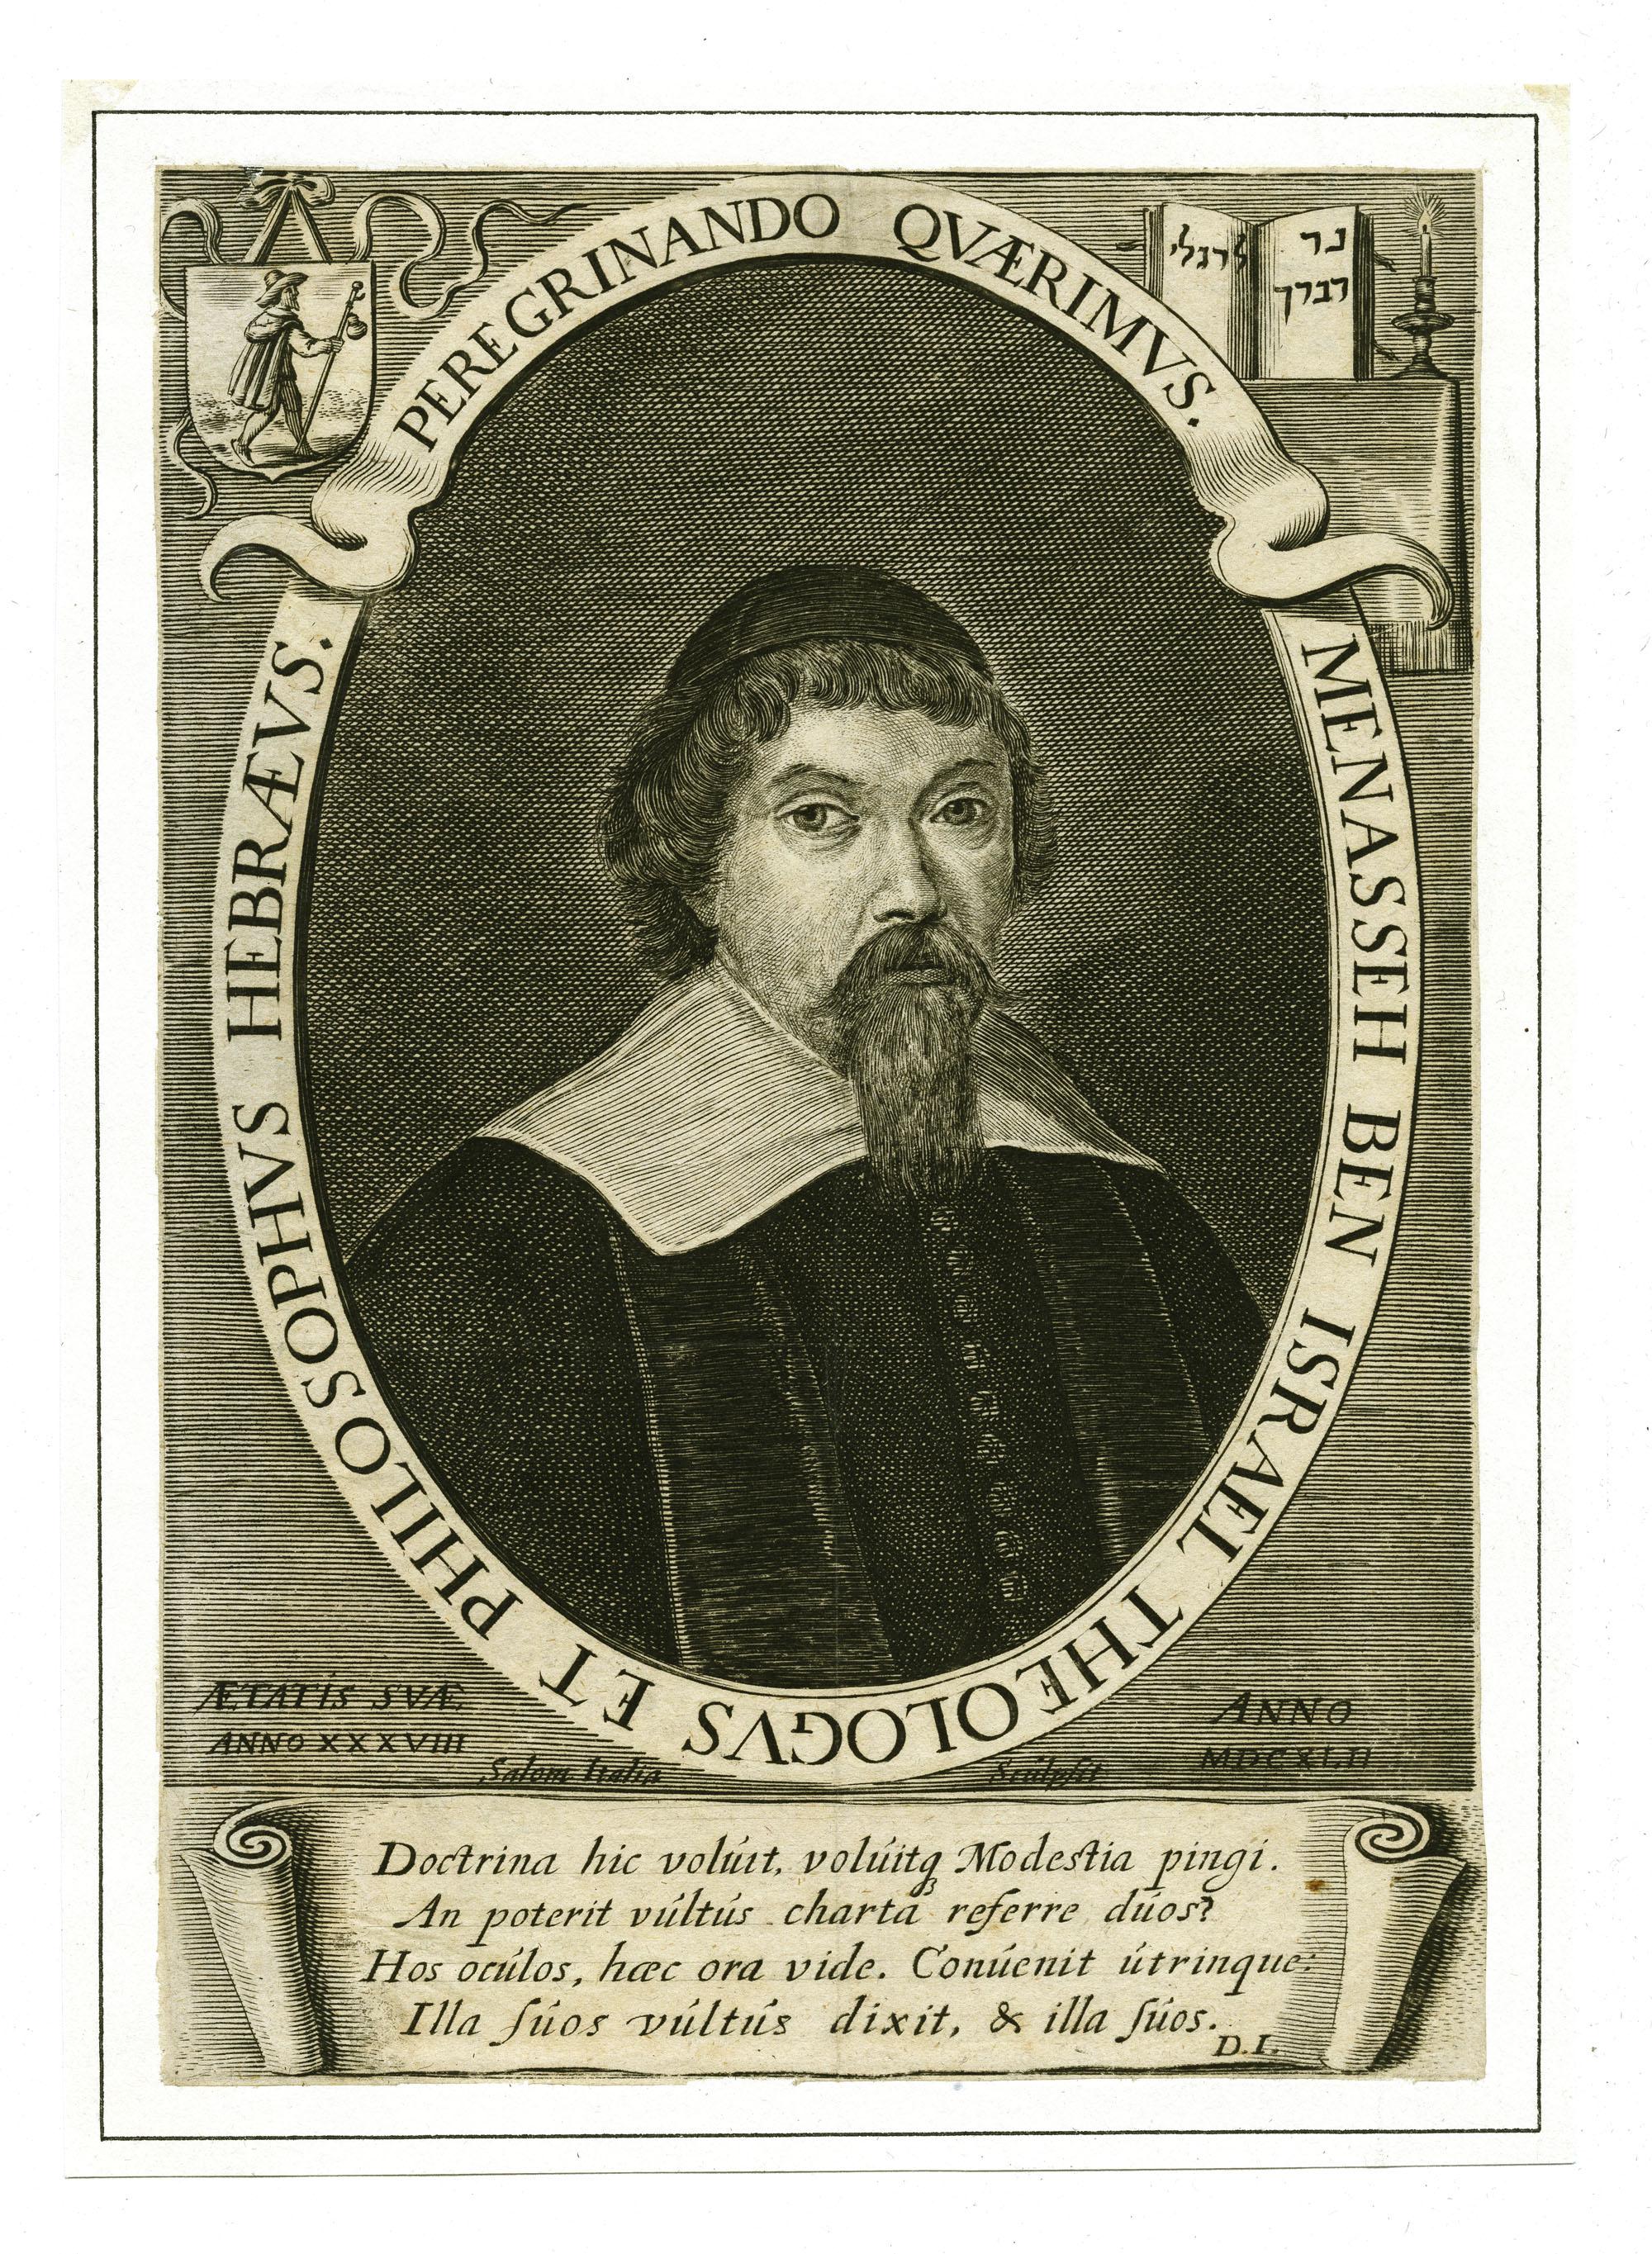 Menasseh Ben Israel Theologus et Philosophus Hebræus